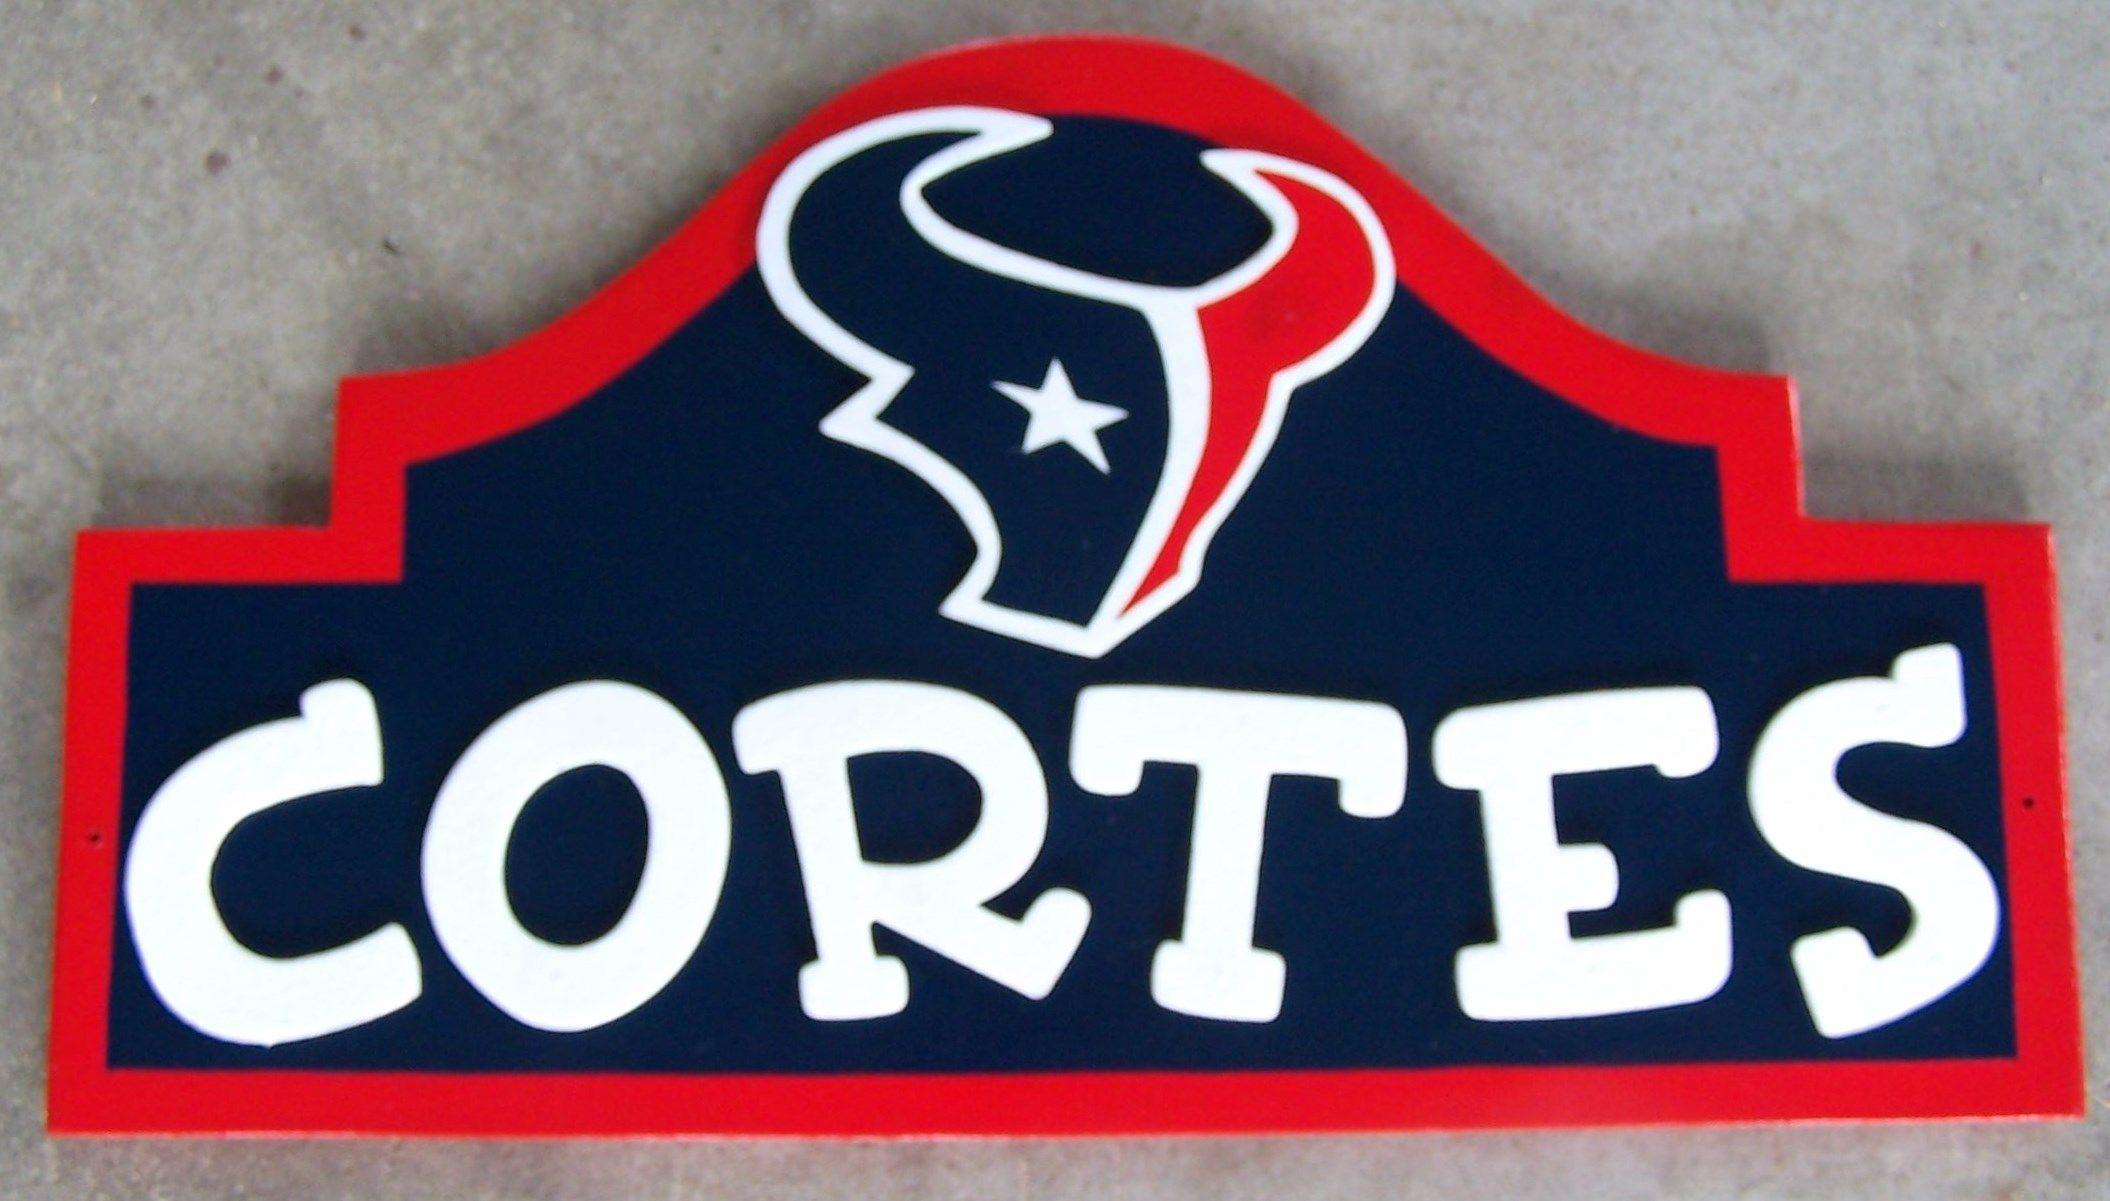 Houston Texans Man Cave Accessories : Houston texans wood decor name sign custom made